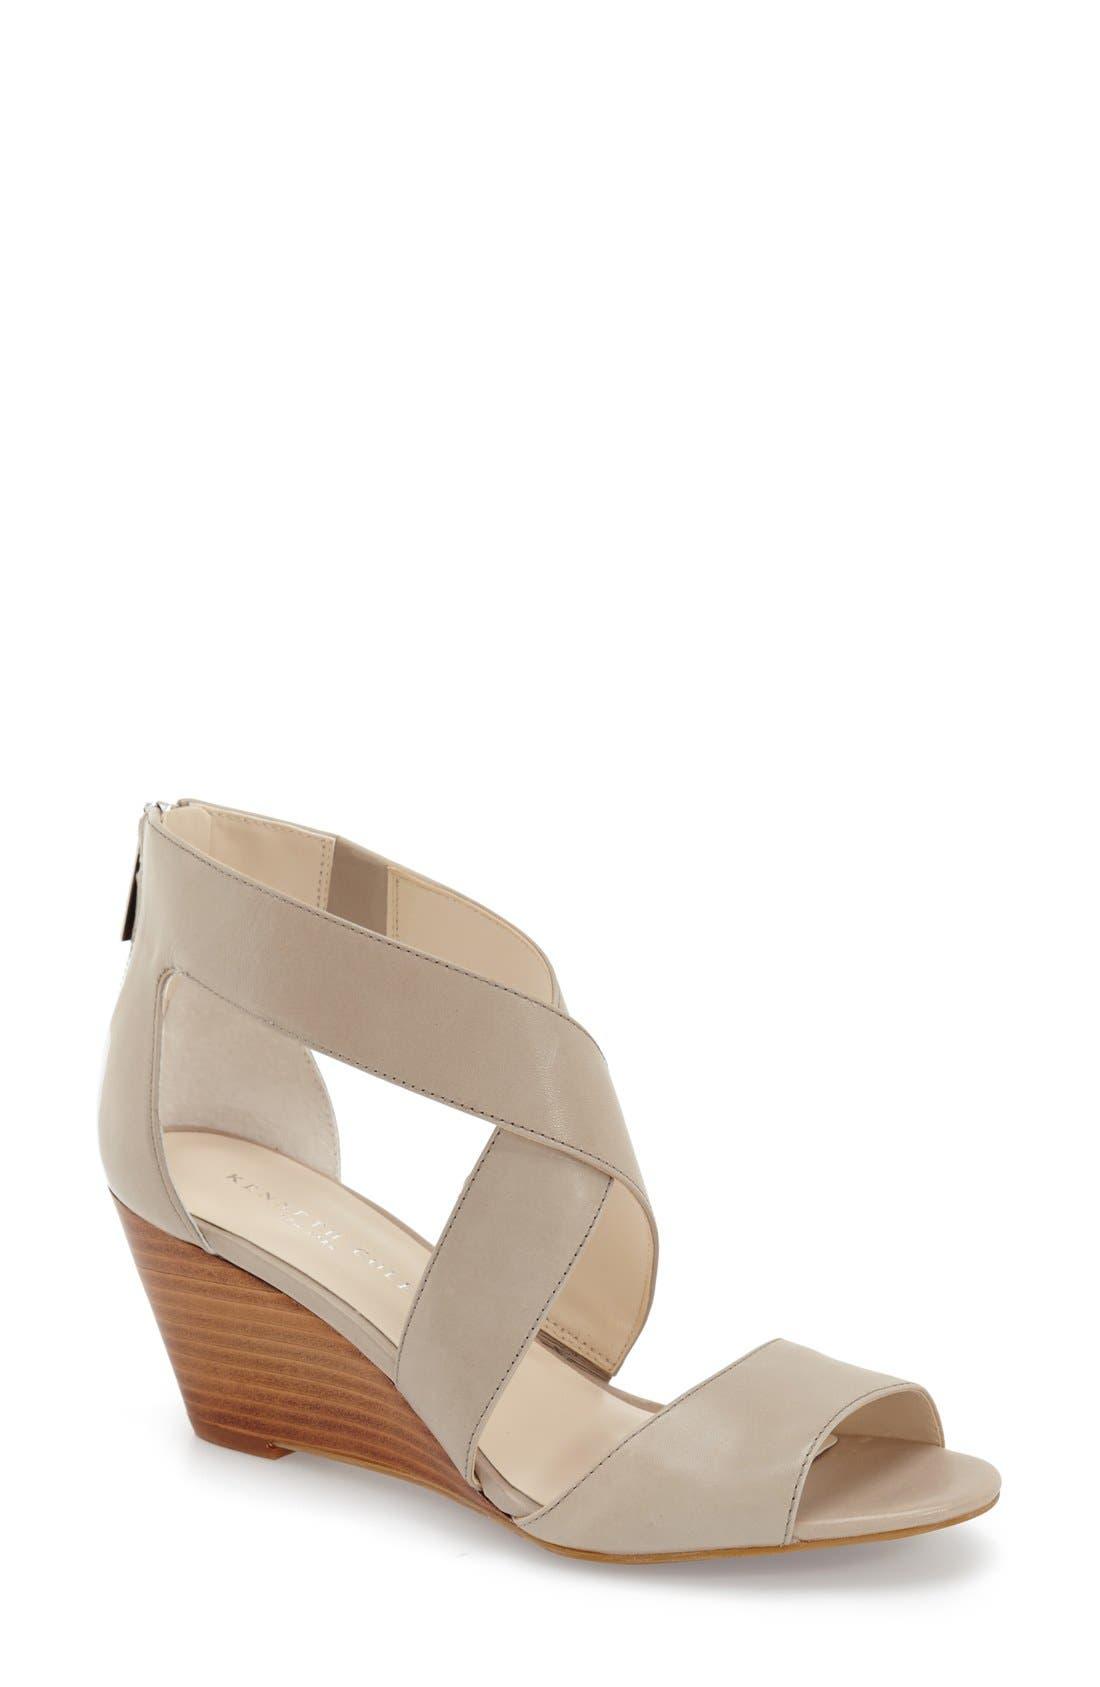 Kenneth Cole New York 'Drina' Wedge Sandal (Women)